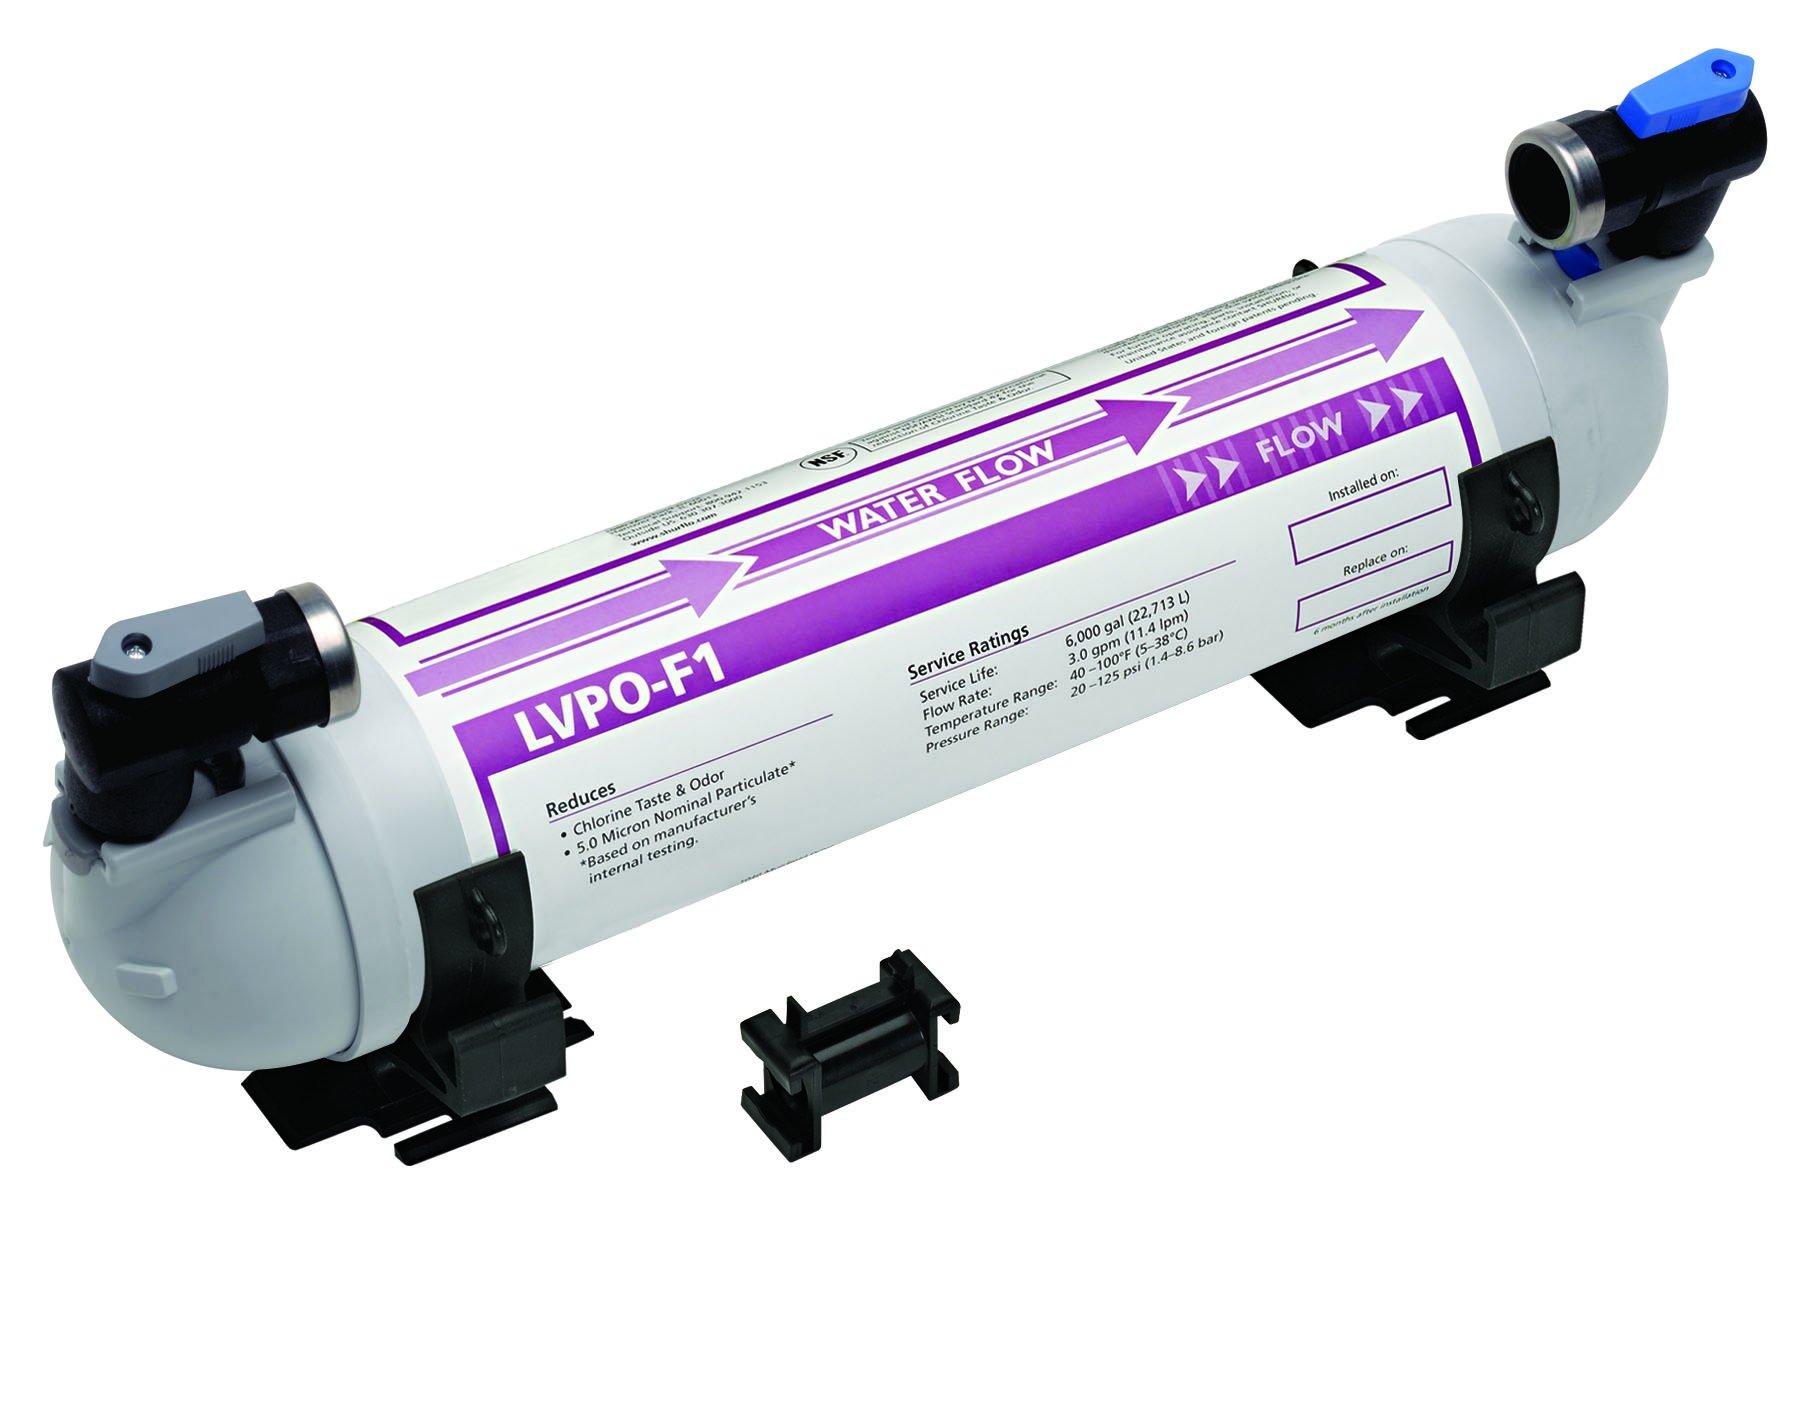 Shurflo LVPO-F1 (94-751-00) Water Filtration System